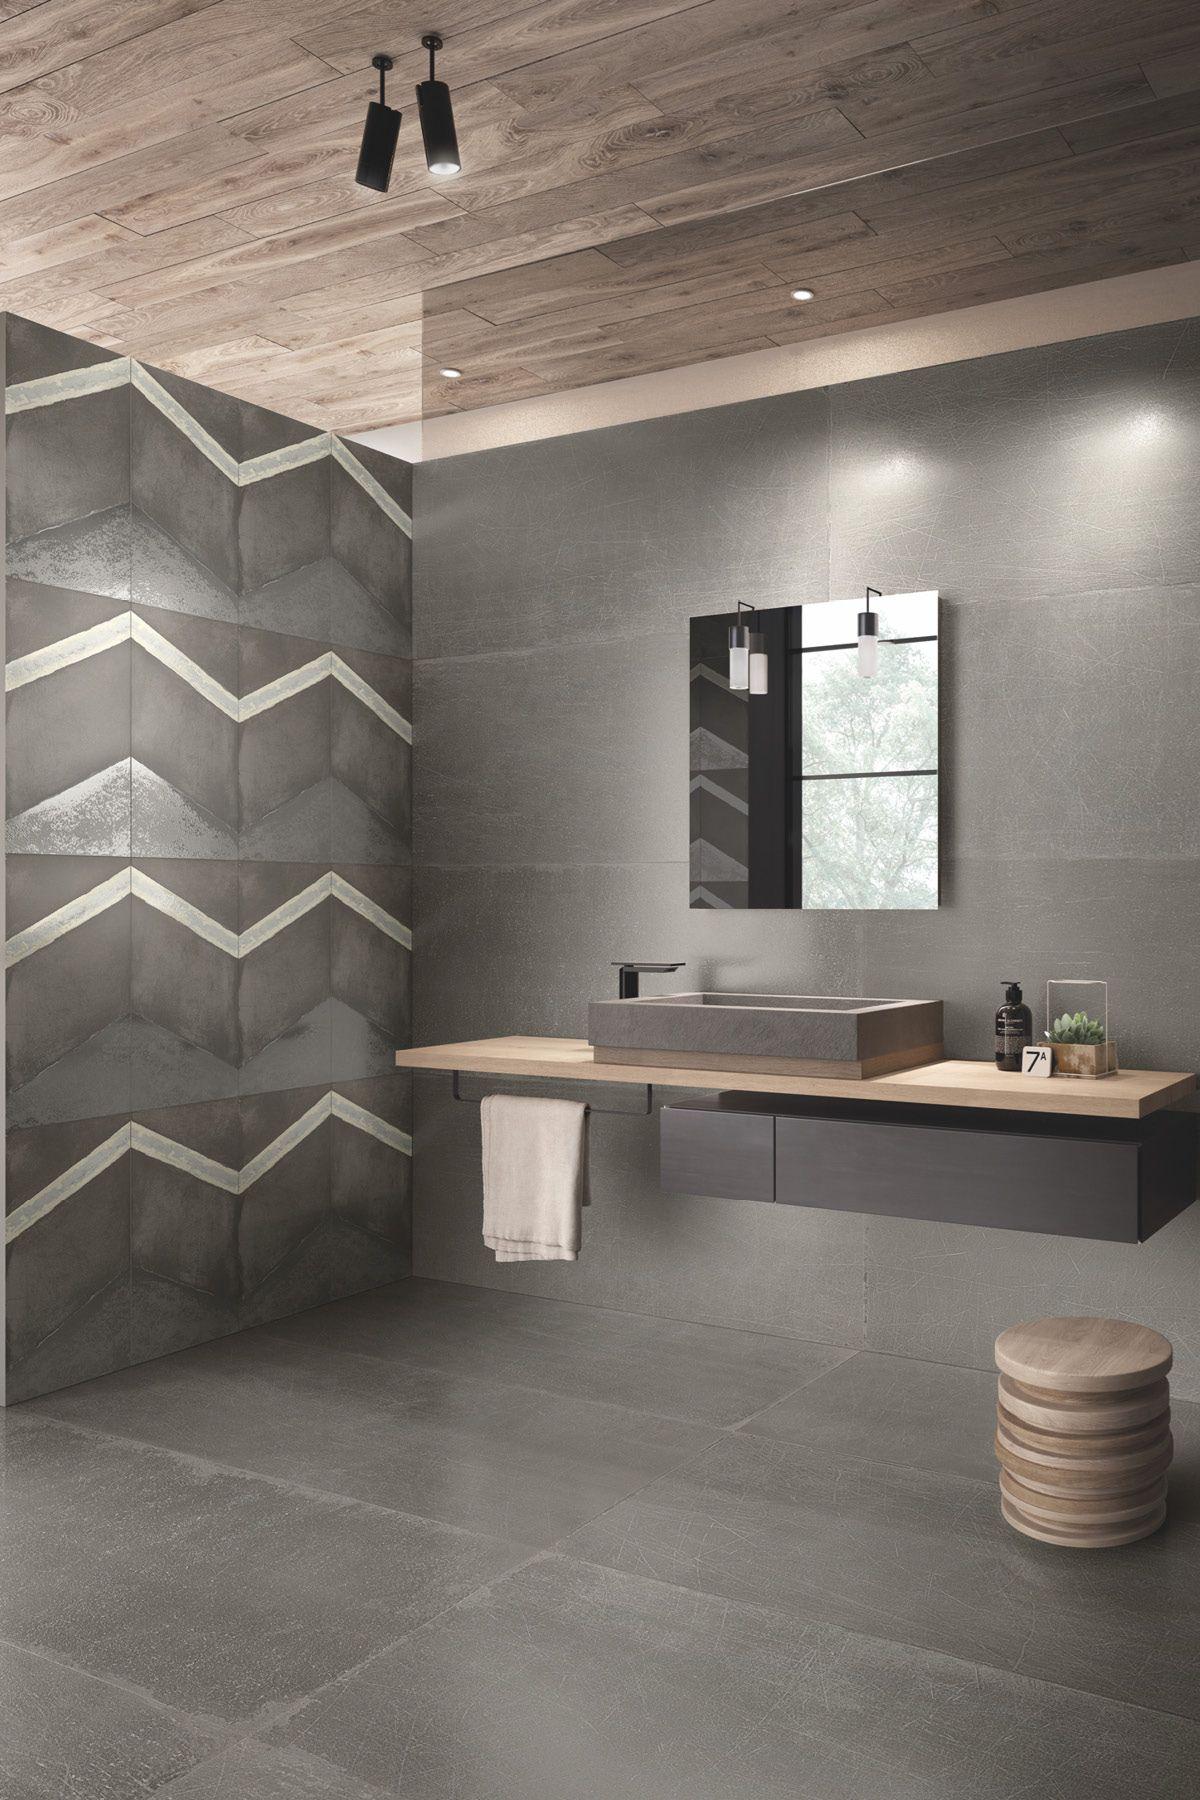 Viva L H Toilet Tiles Design Bathroom Design Luxury Bathroom Lighting Design